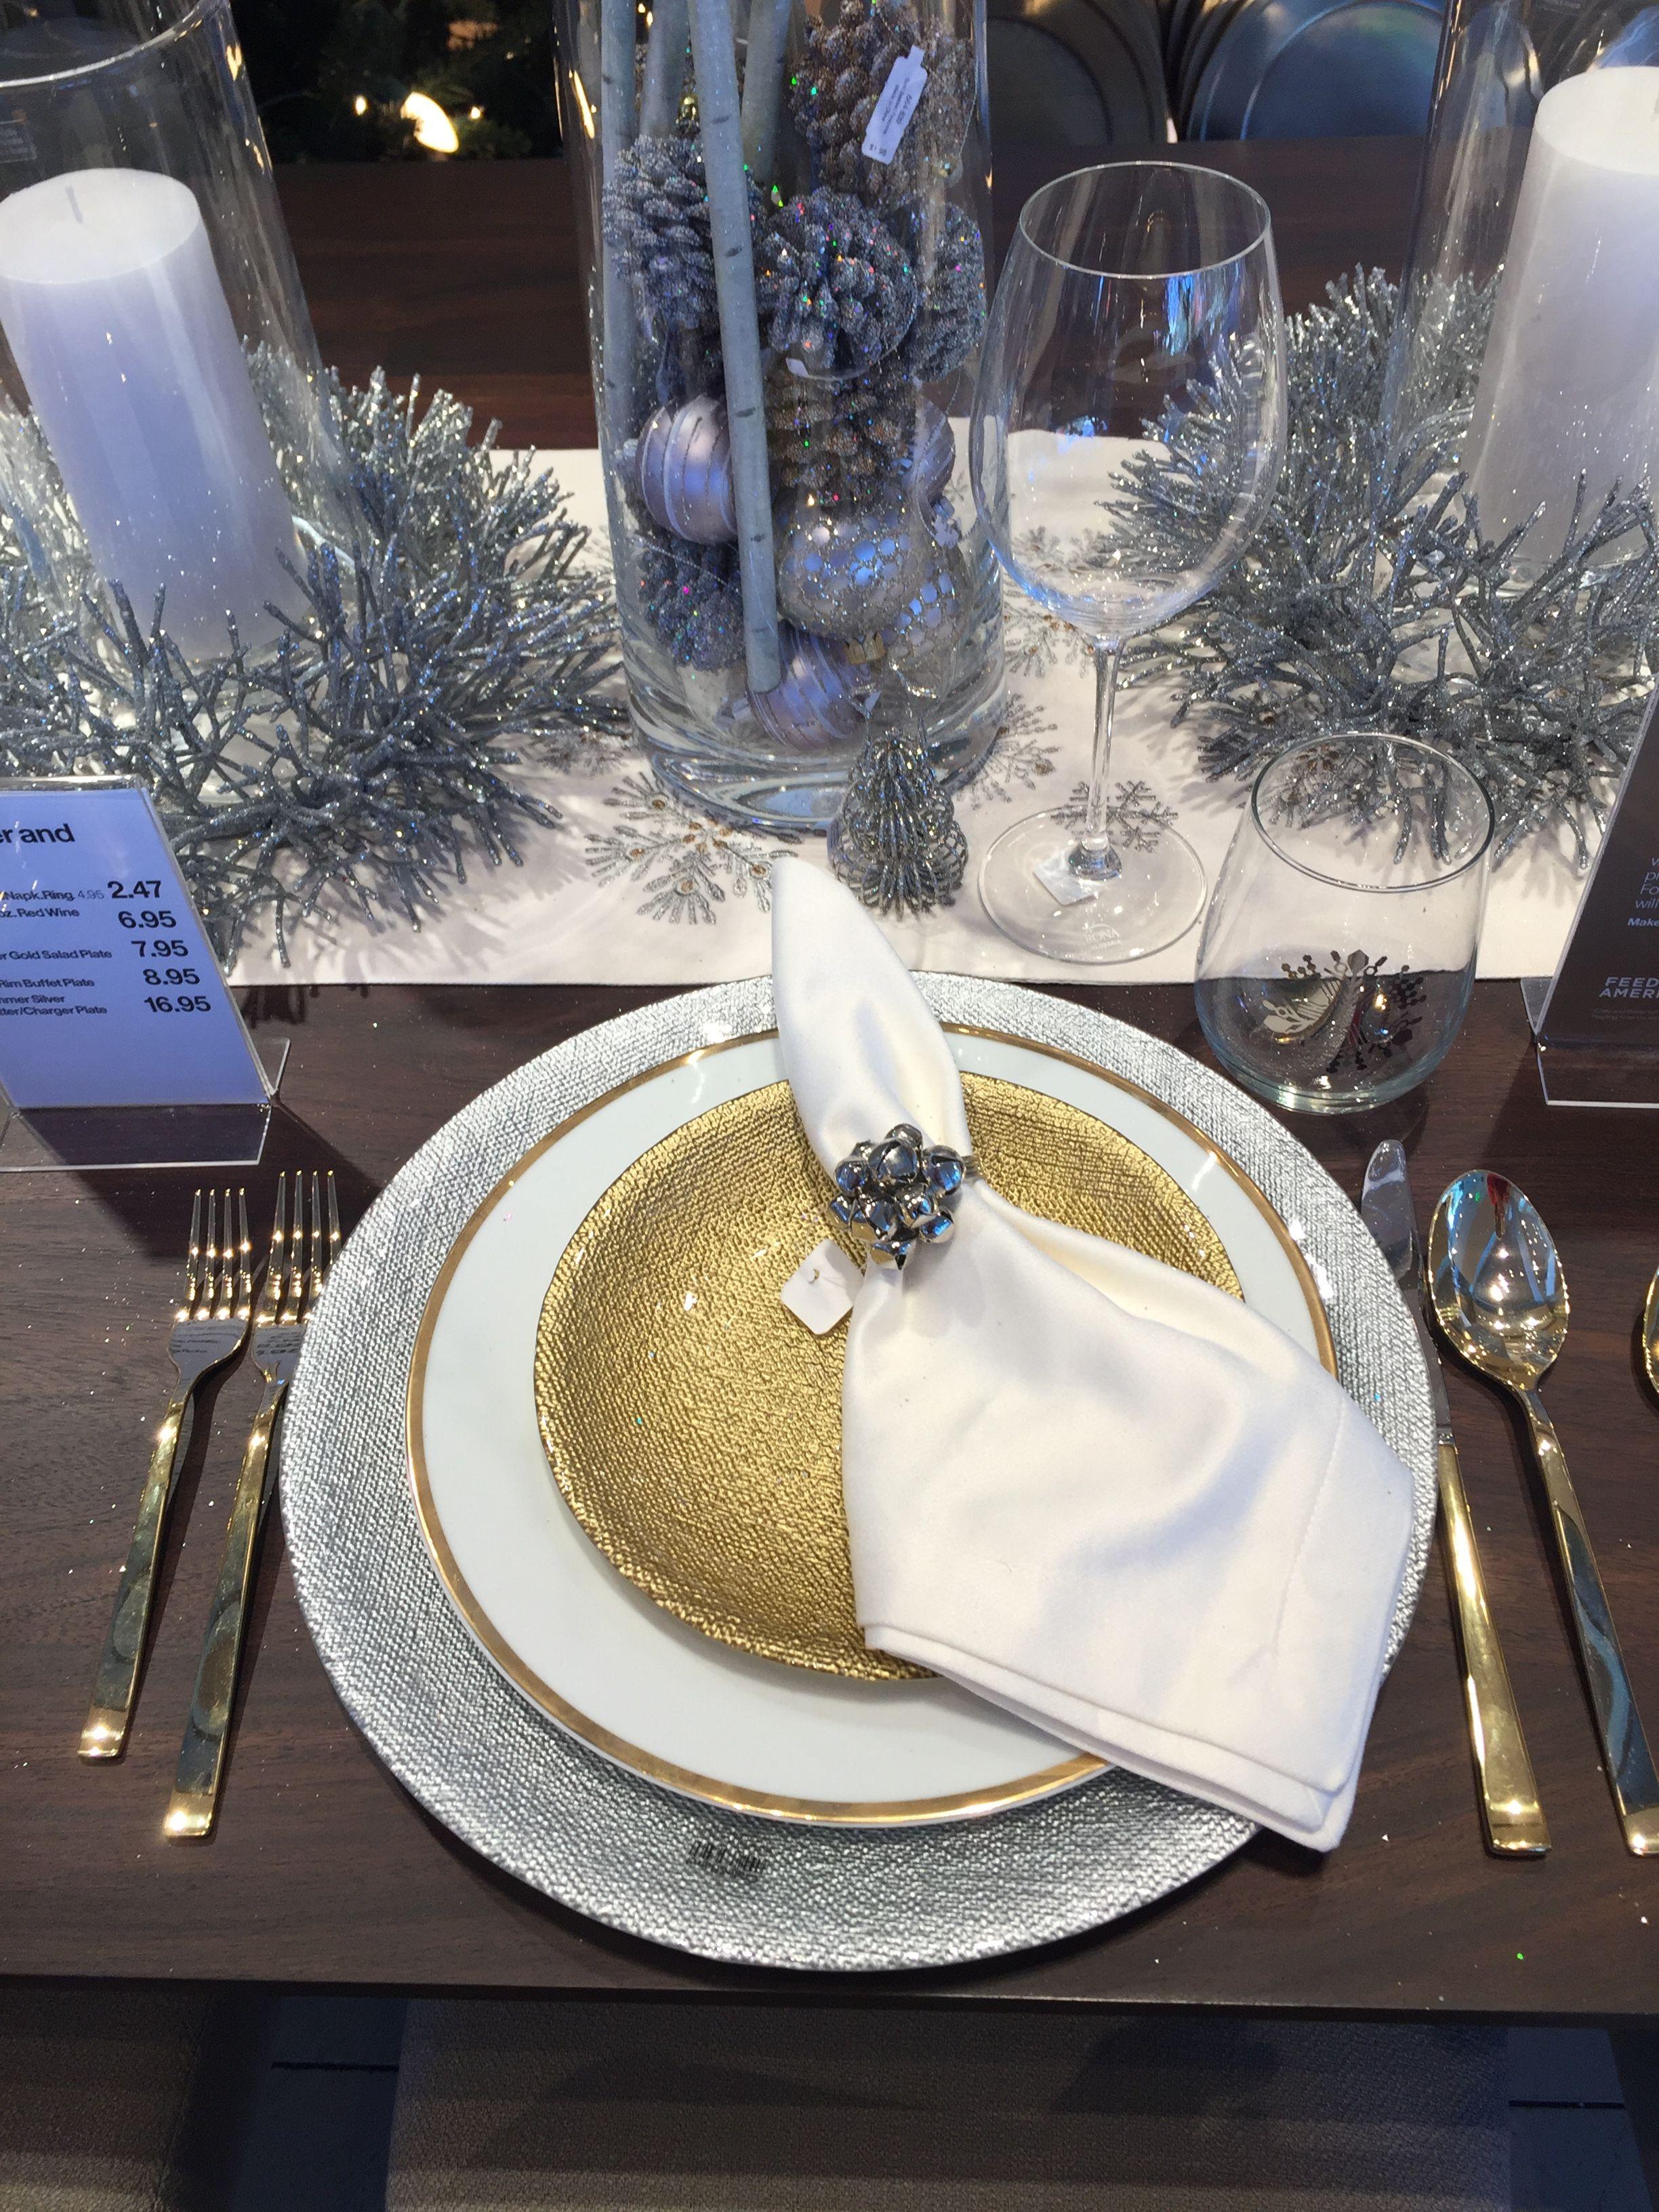 Christmas 2016 White Gold Silver Crate And Barrel Napkin Ring Charger Table Runner Decoracion De Unas Navidad Mesas